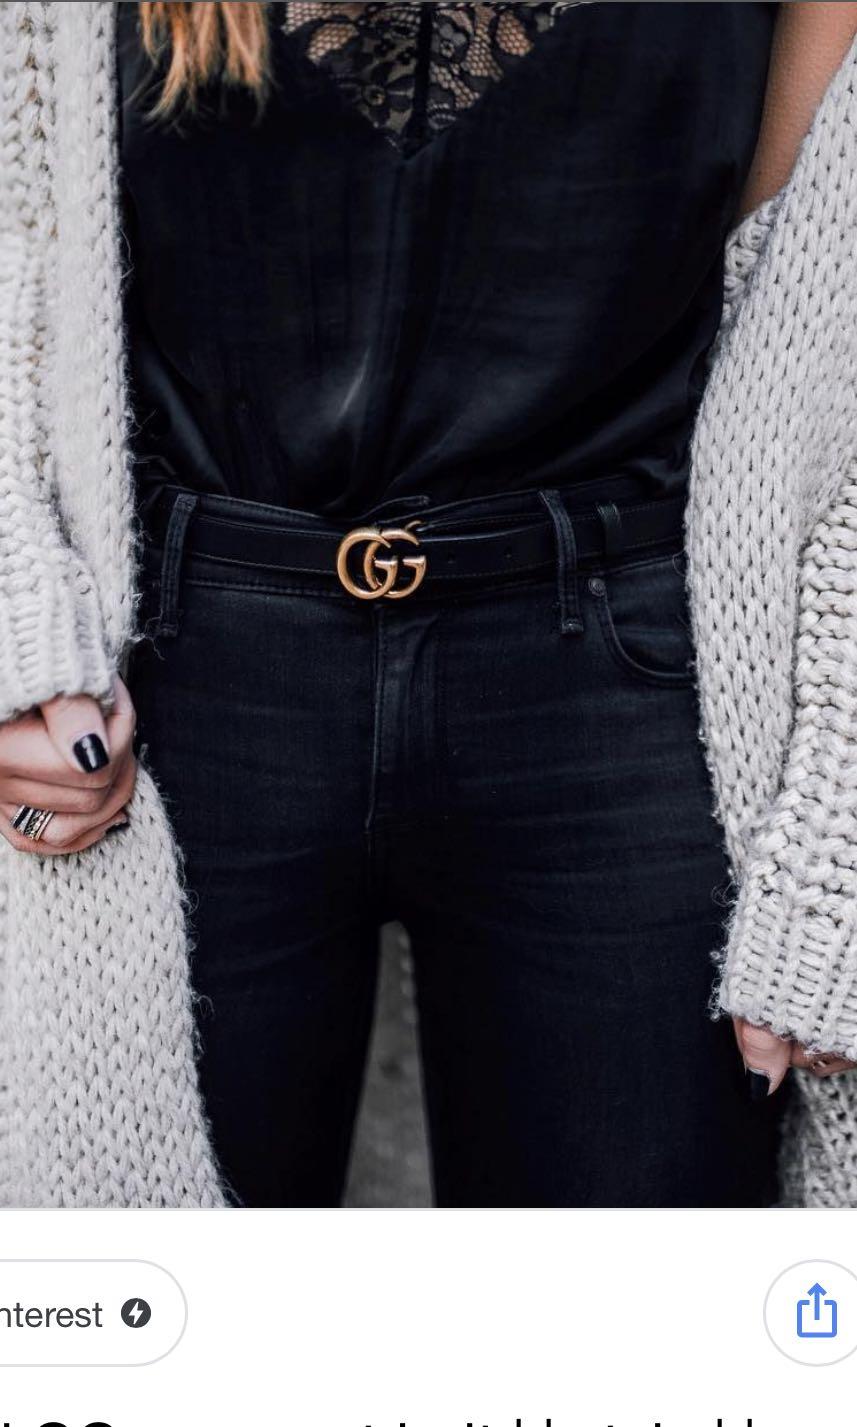 2f7513dd4f7 Home · Women s Fashion · Accessories · Belts. photo photo photo